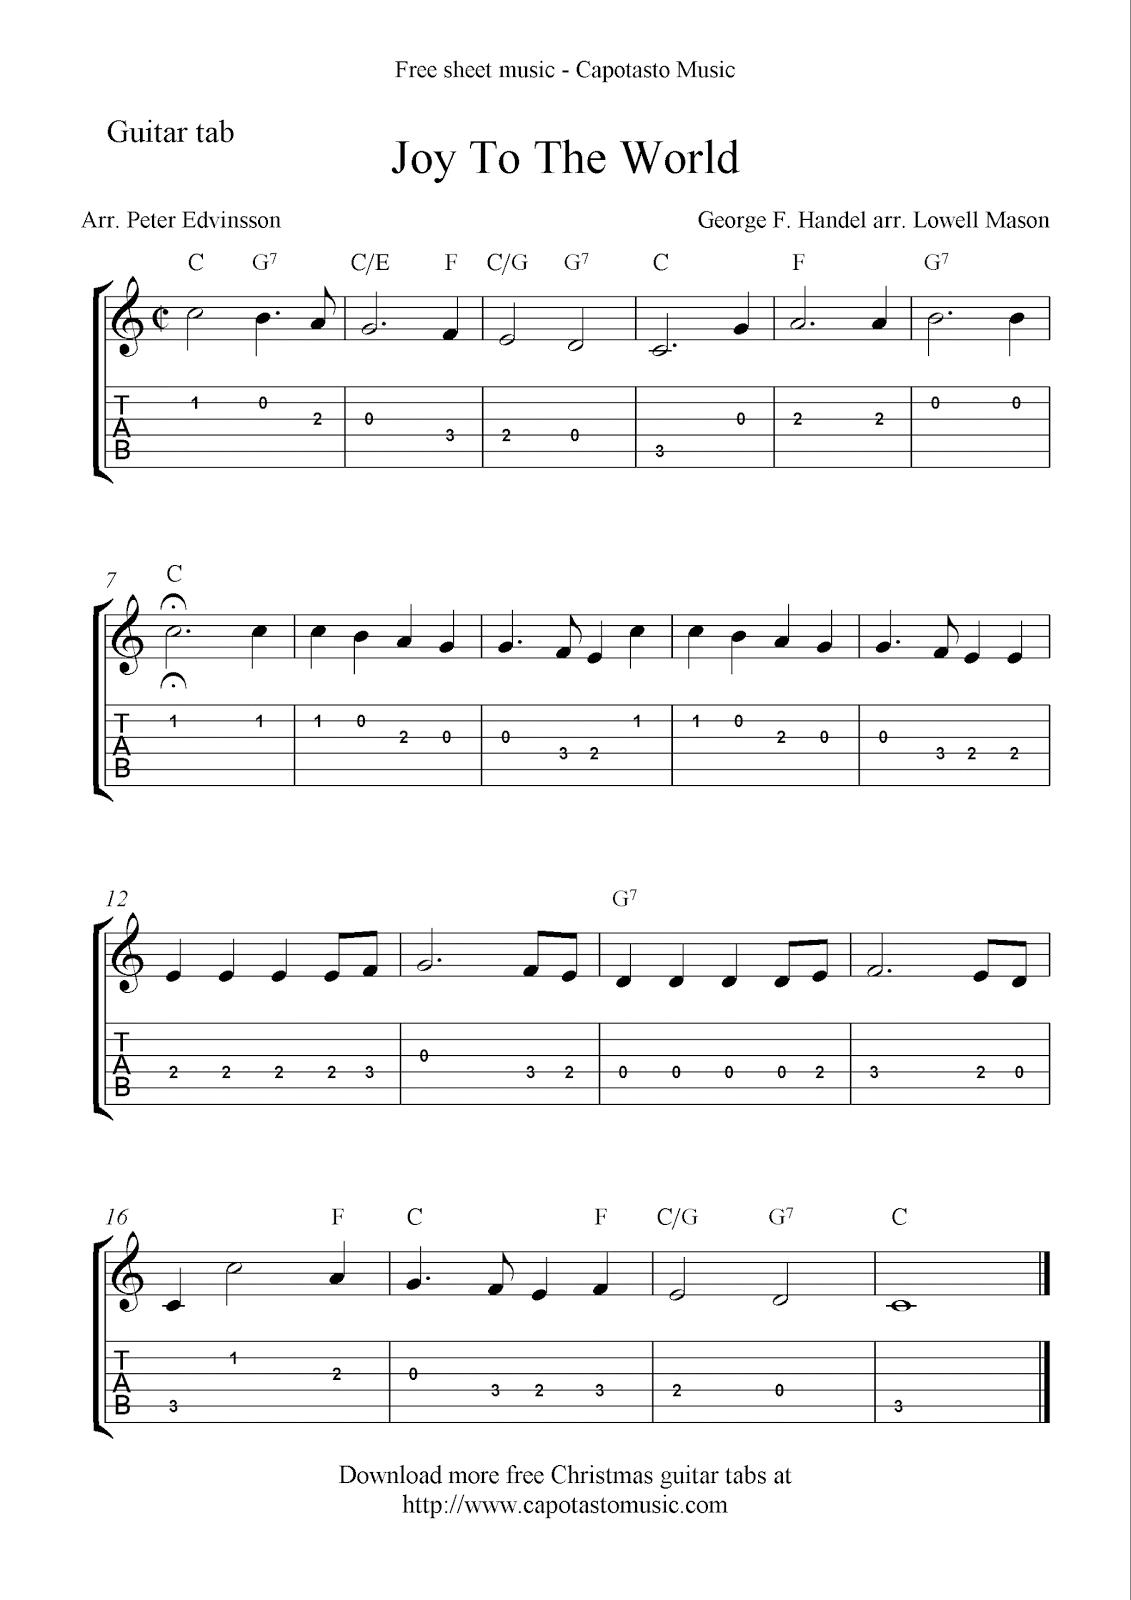 Free Printable Sheet Music: Joy To The World, Free Christmas Guitar - Free Printable Guitar Music